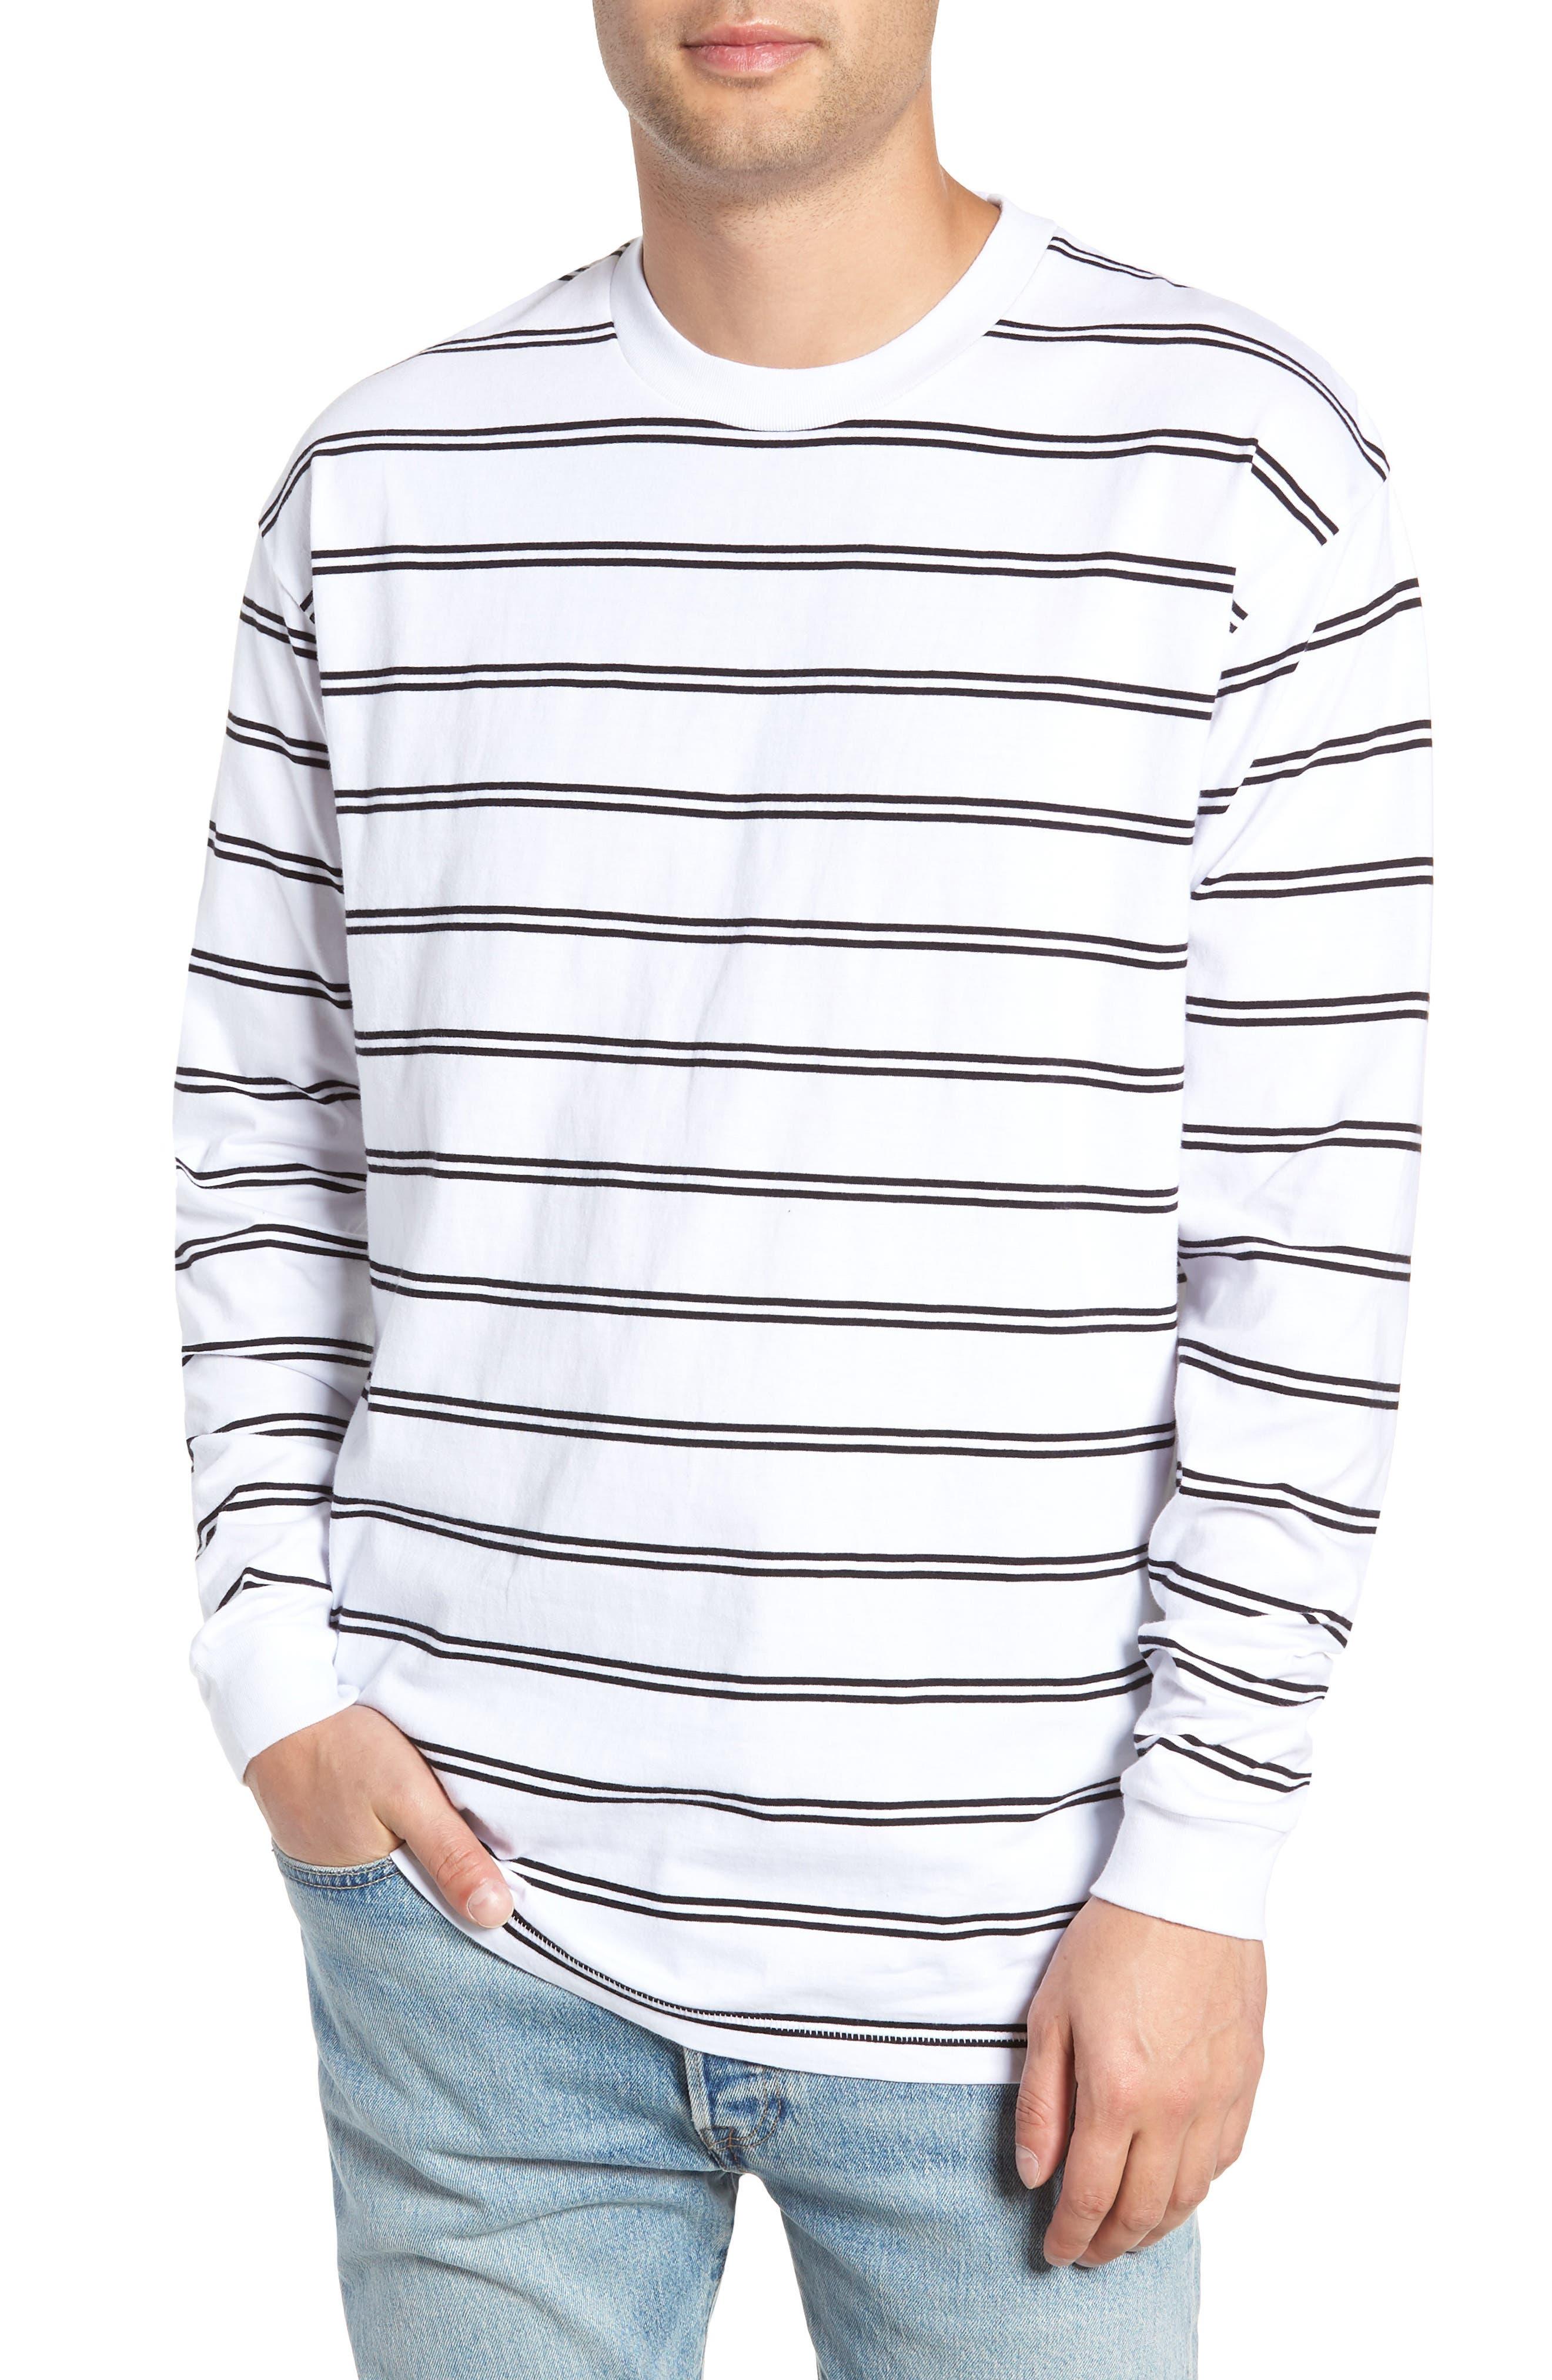 Channel Box Long Sleeve T-Shirt,                             Main thumbnail 1, color,                             100